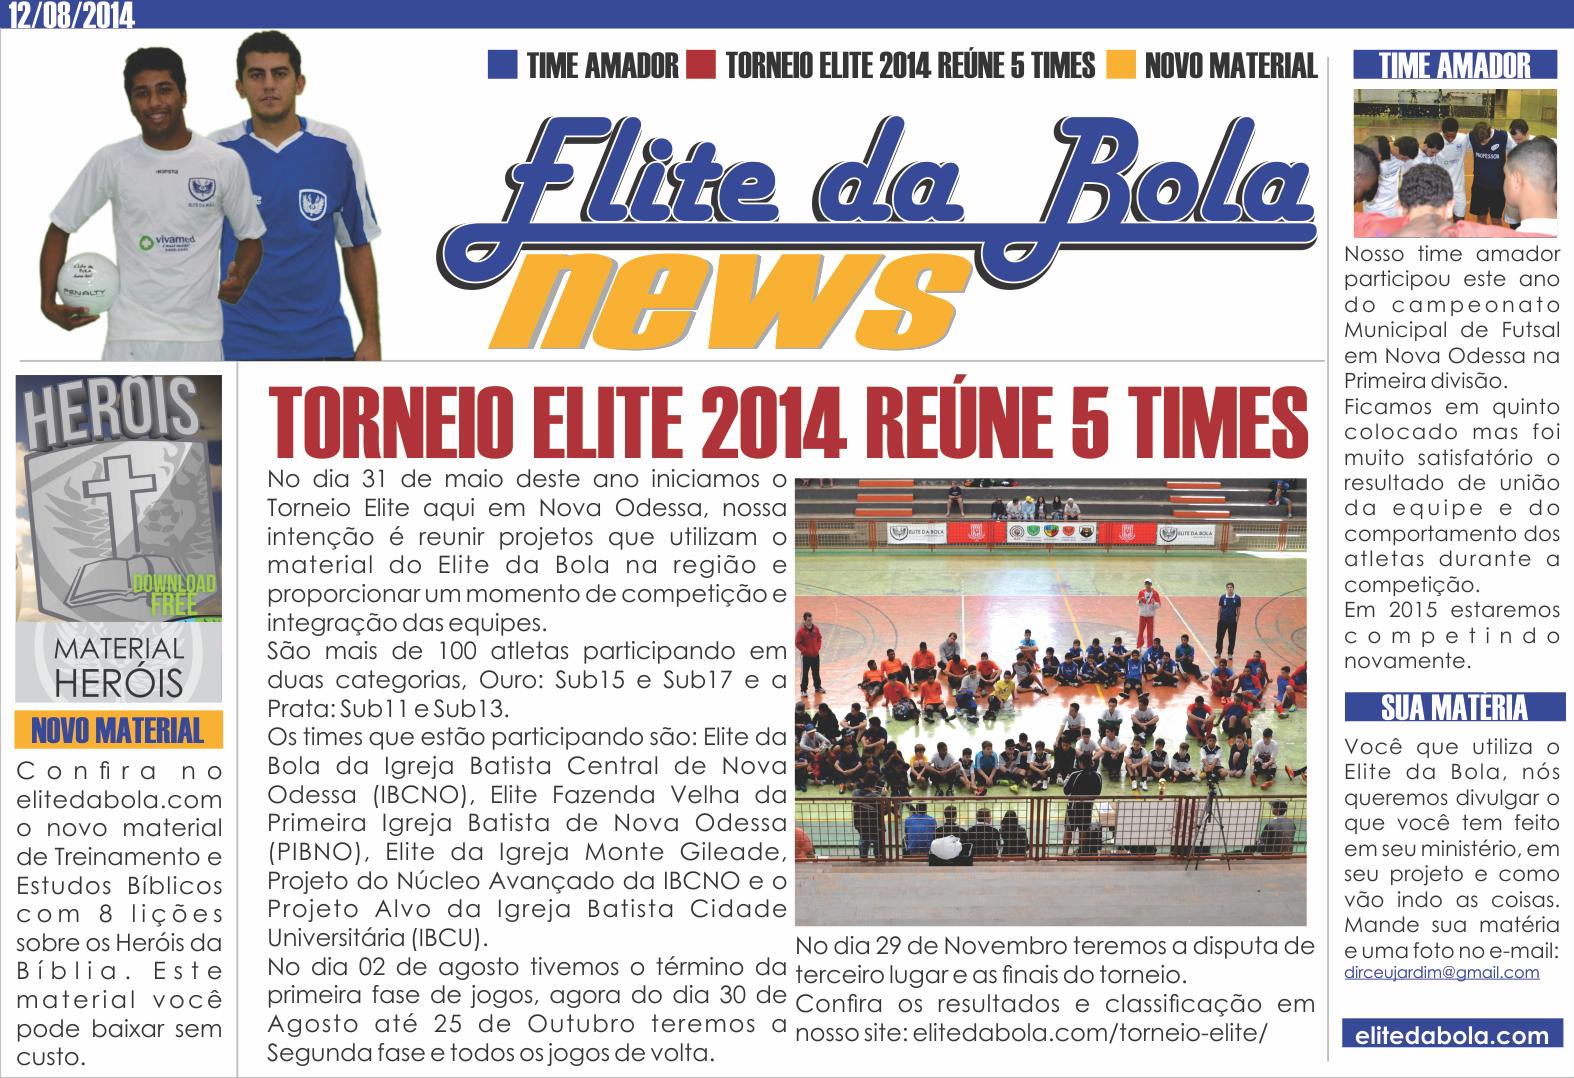 News 12.08.2014